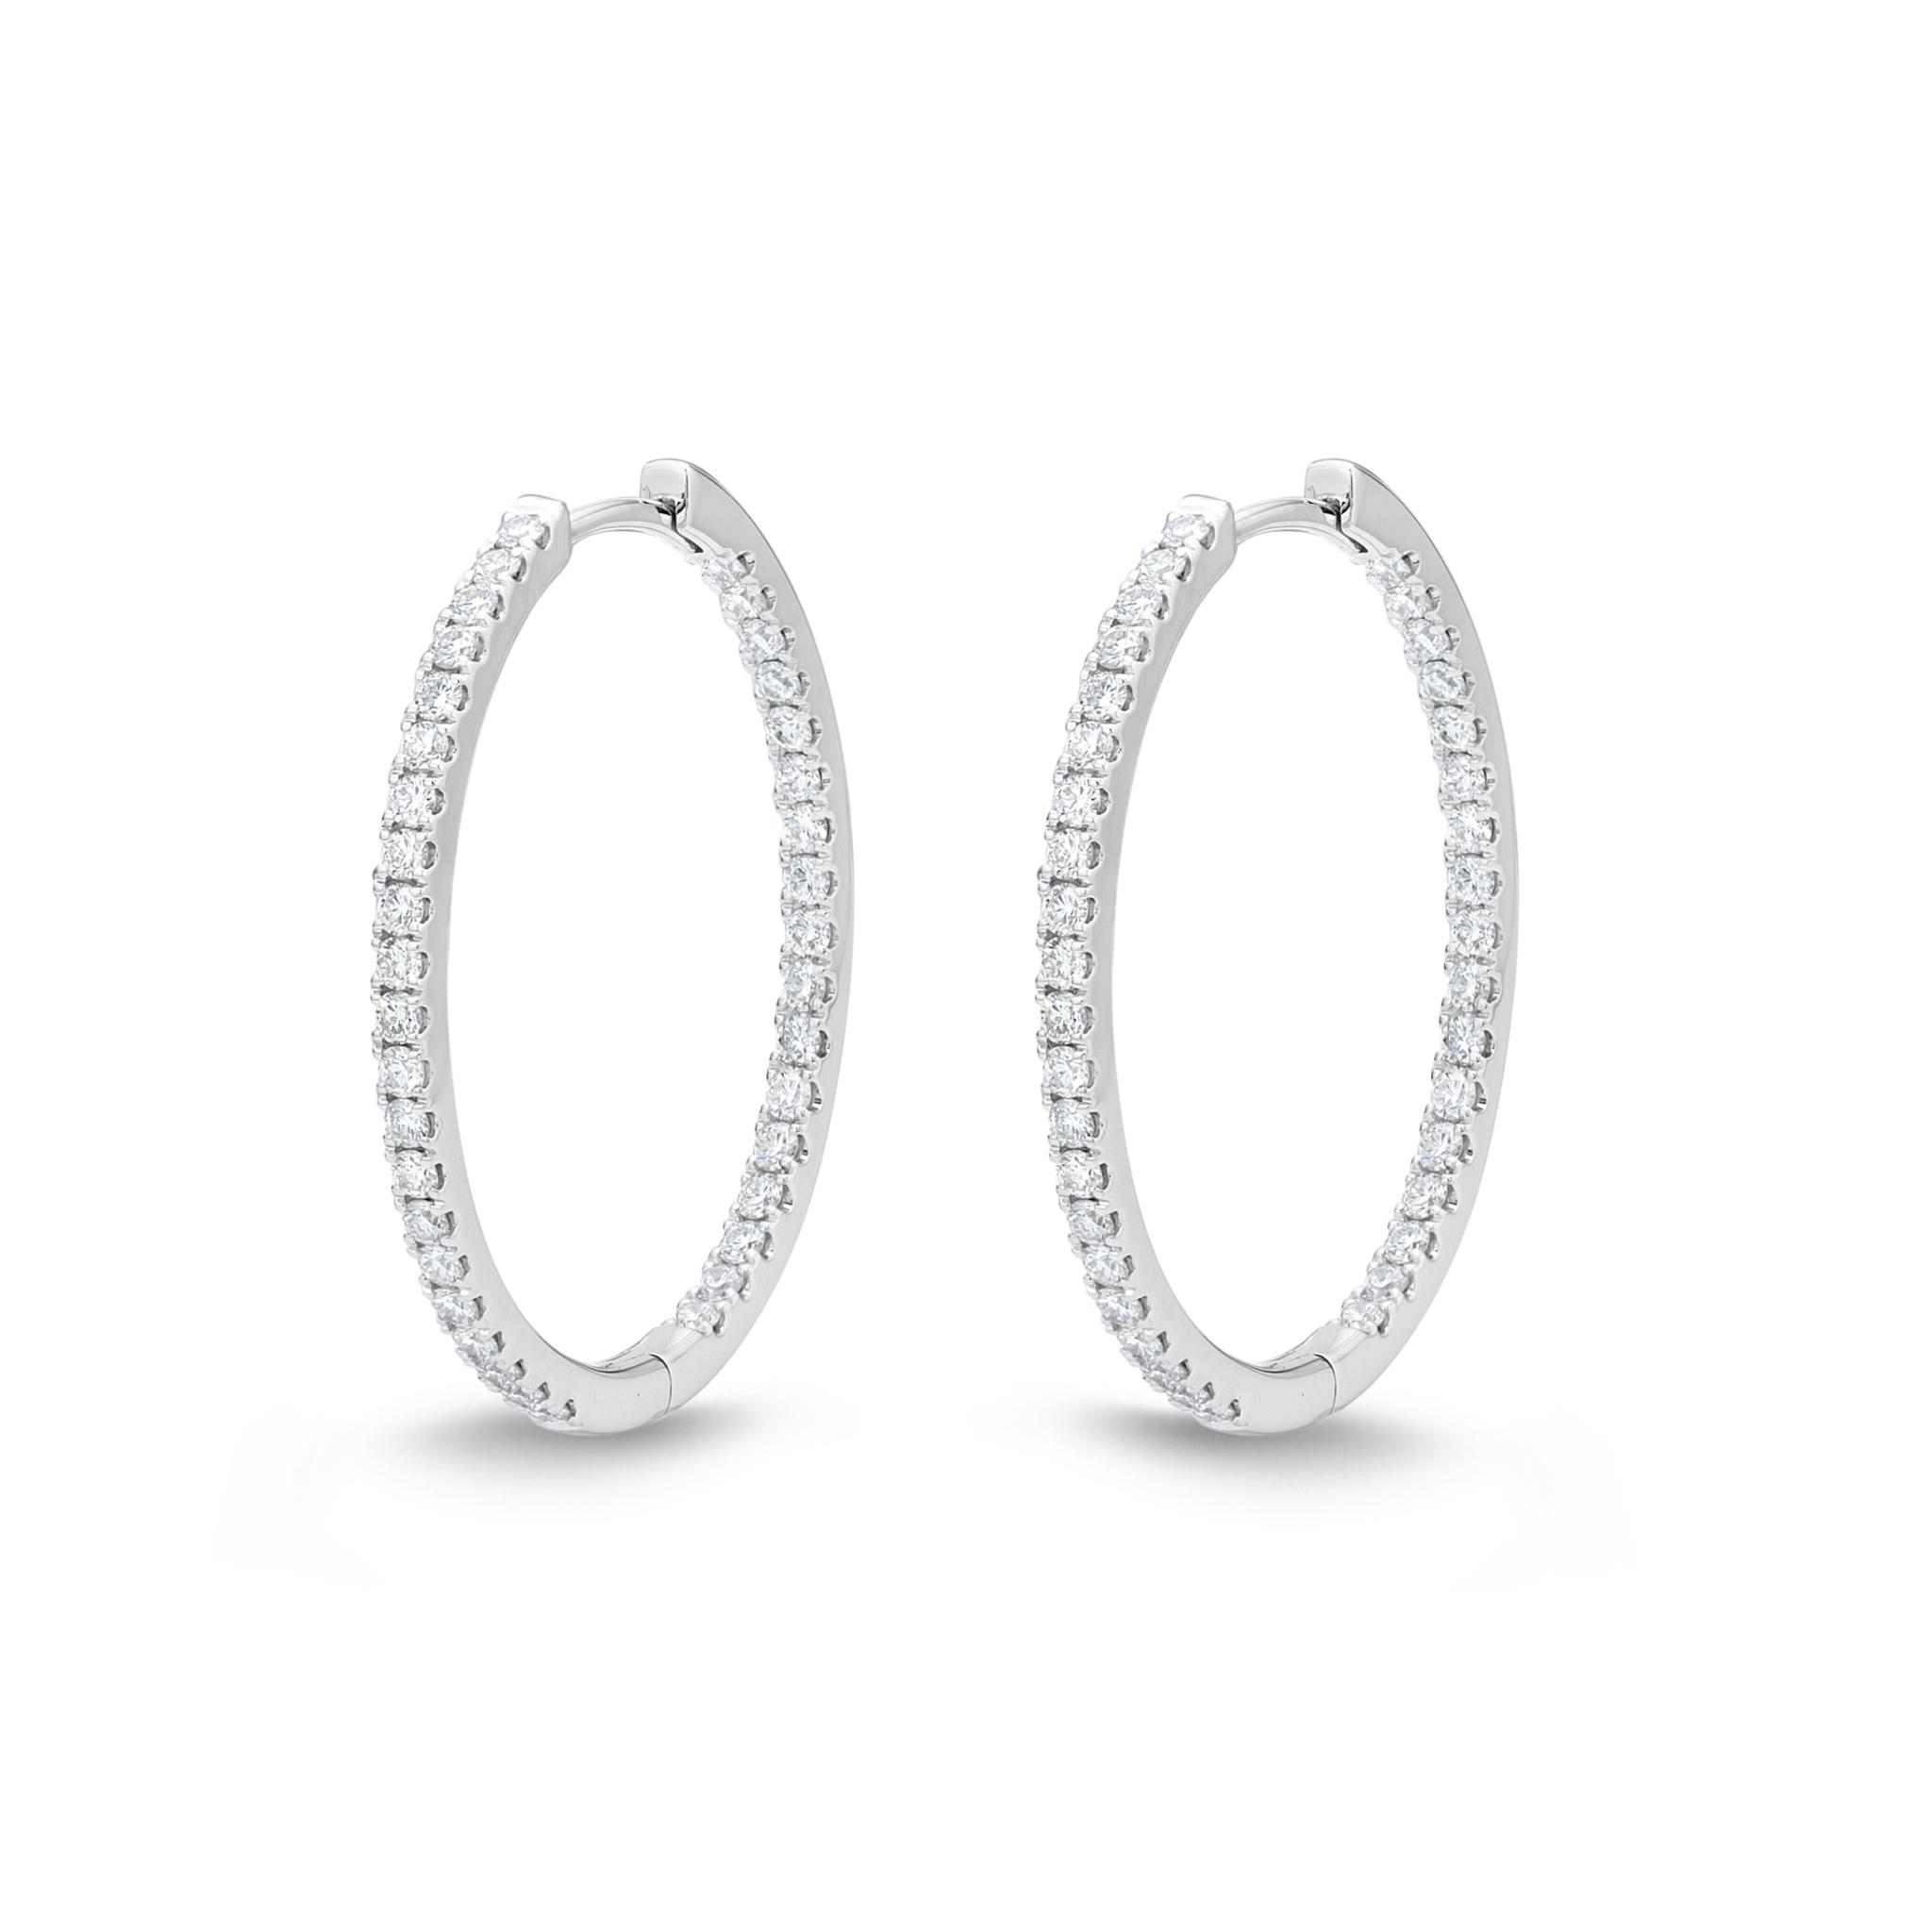 Memoire 18ct White Gold 0.70 Carat Diamond Classic Oval Hoop Earrings 19X23mm